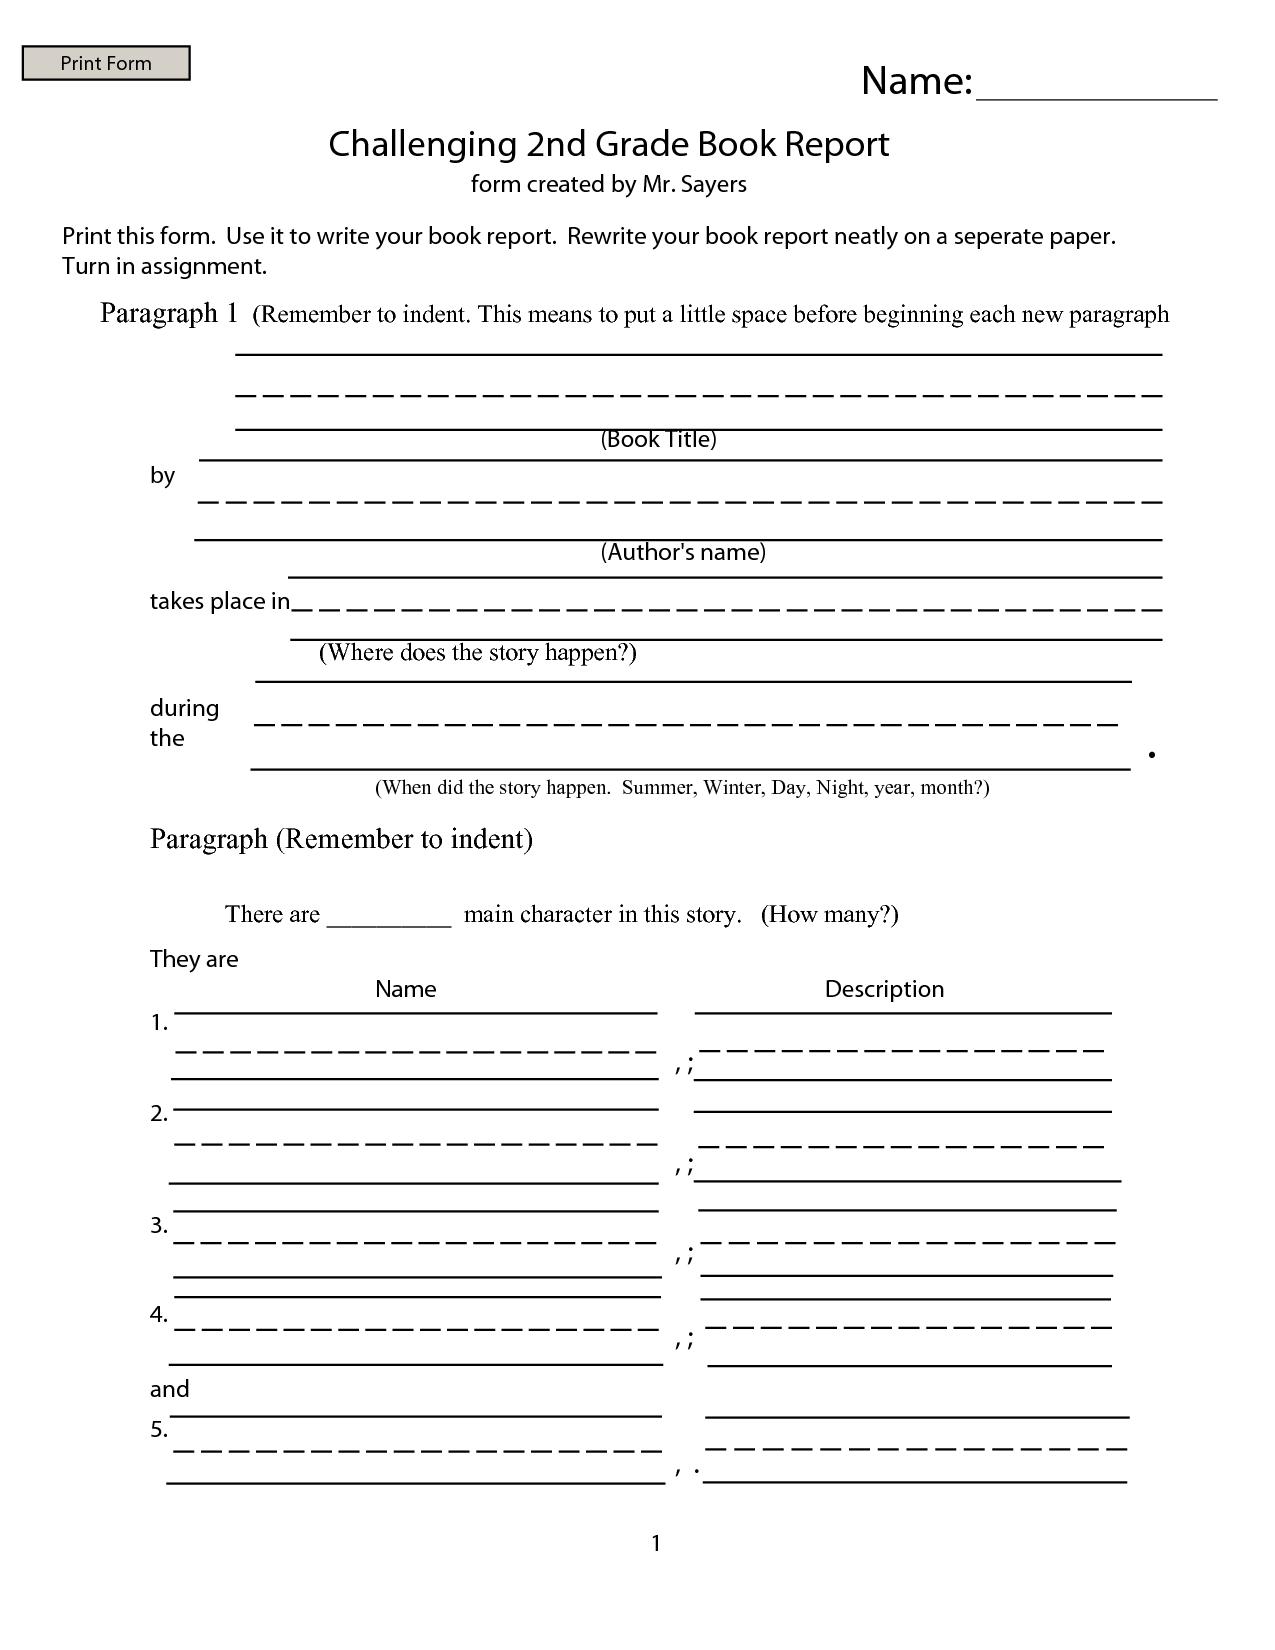 Nd Grade Book Report  Google Search  Homeschooling Ideas